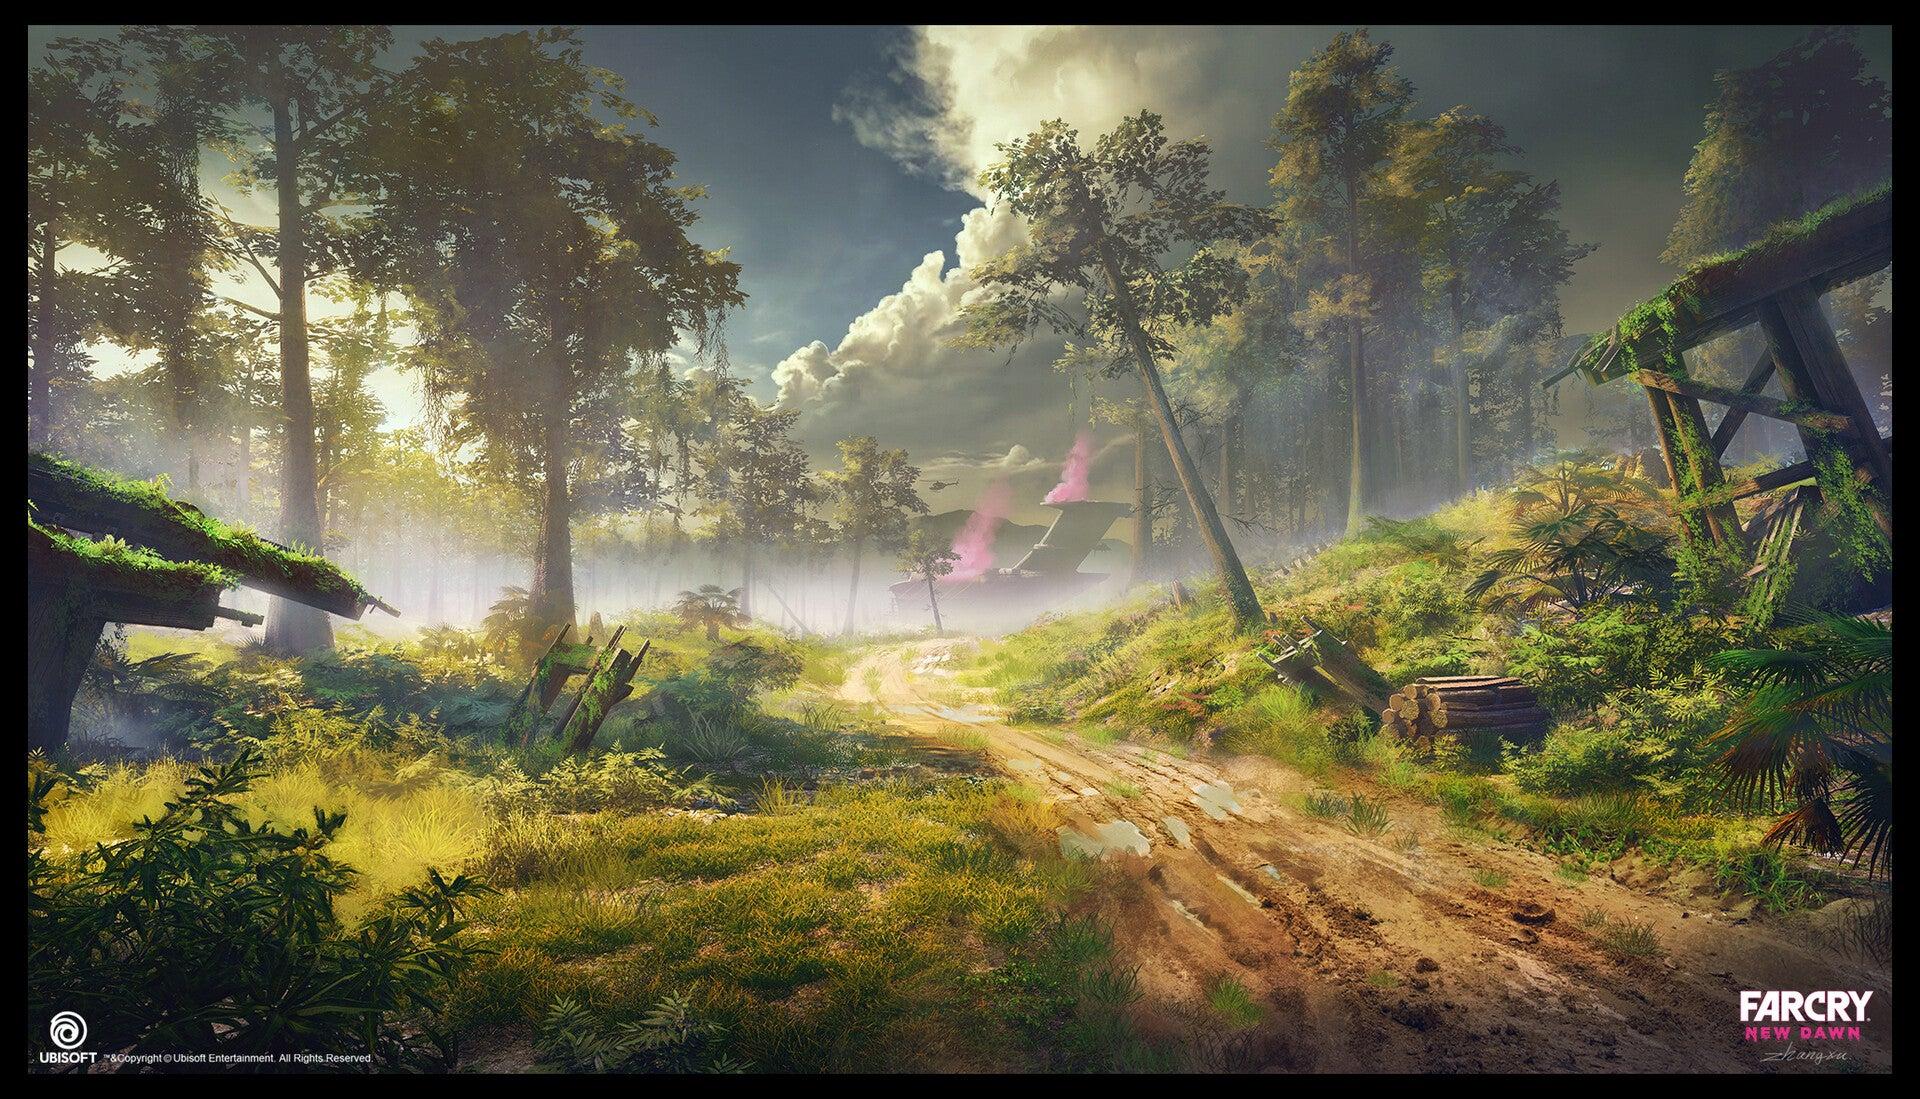 The Art Of Far Cry: New Dawn